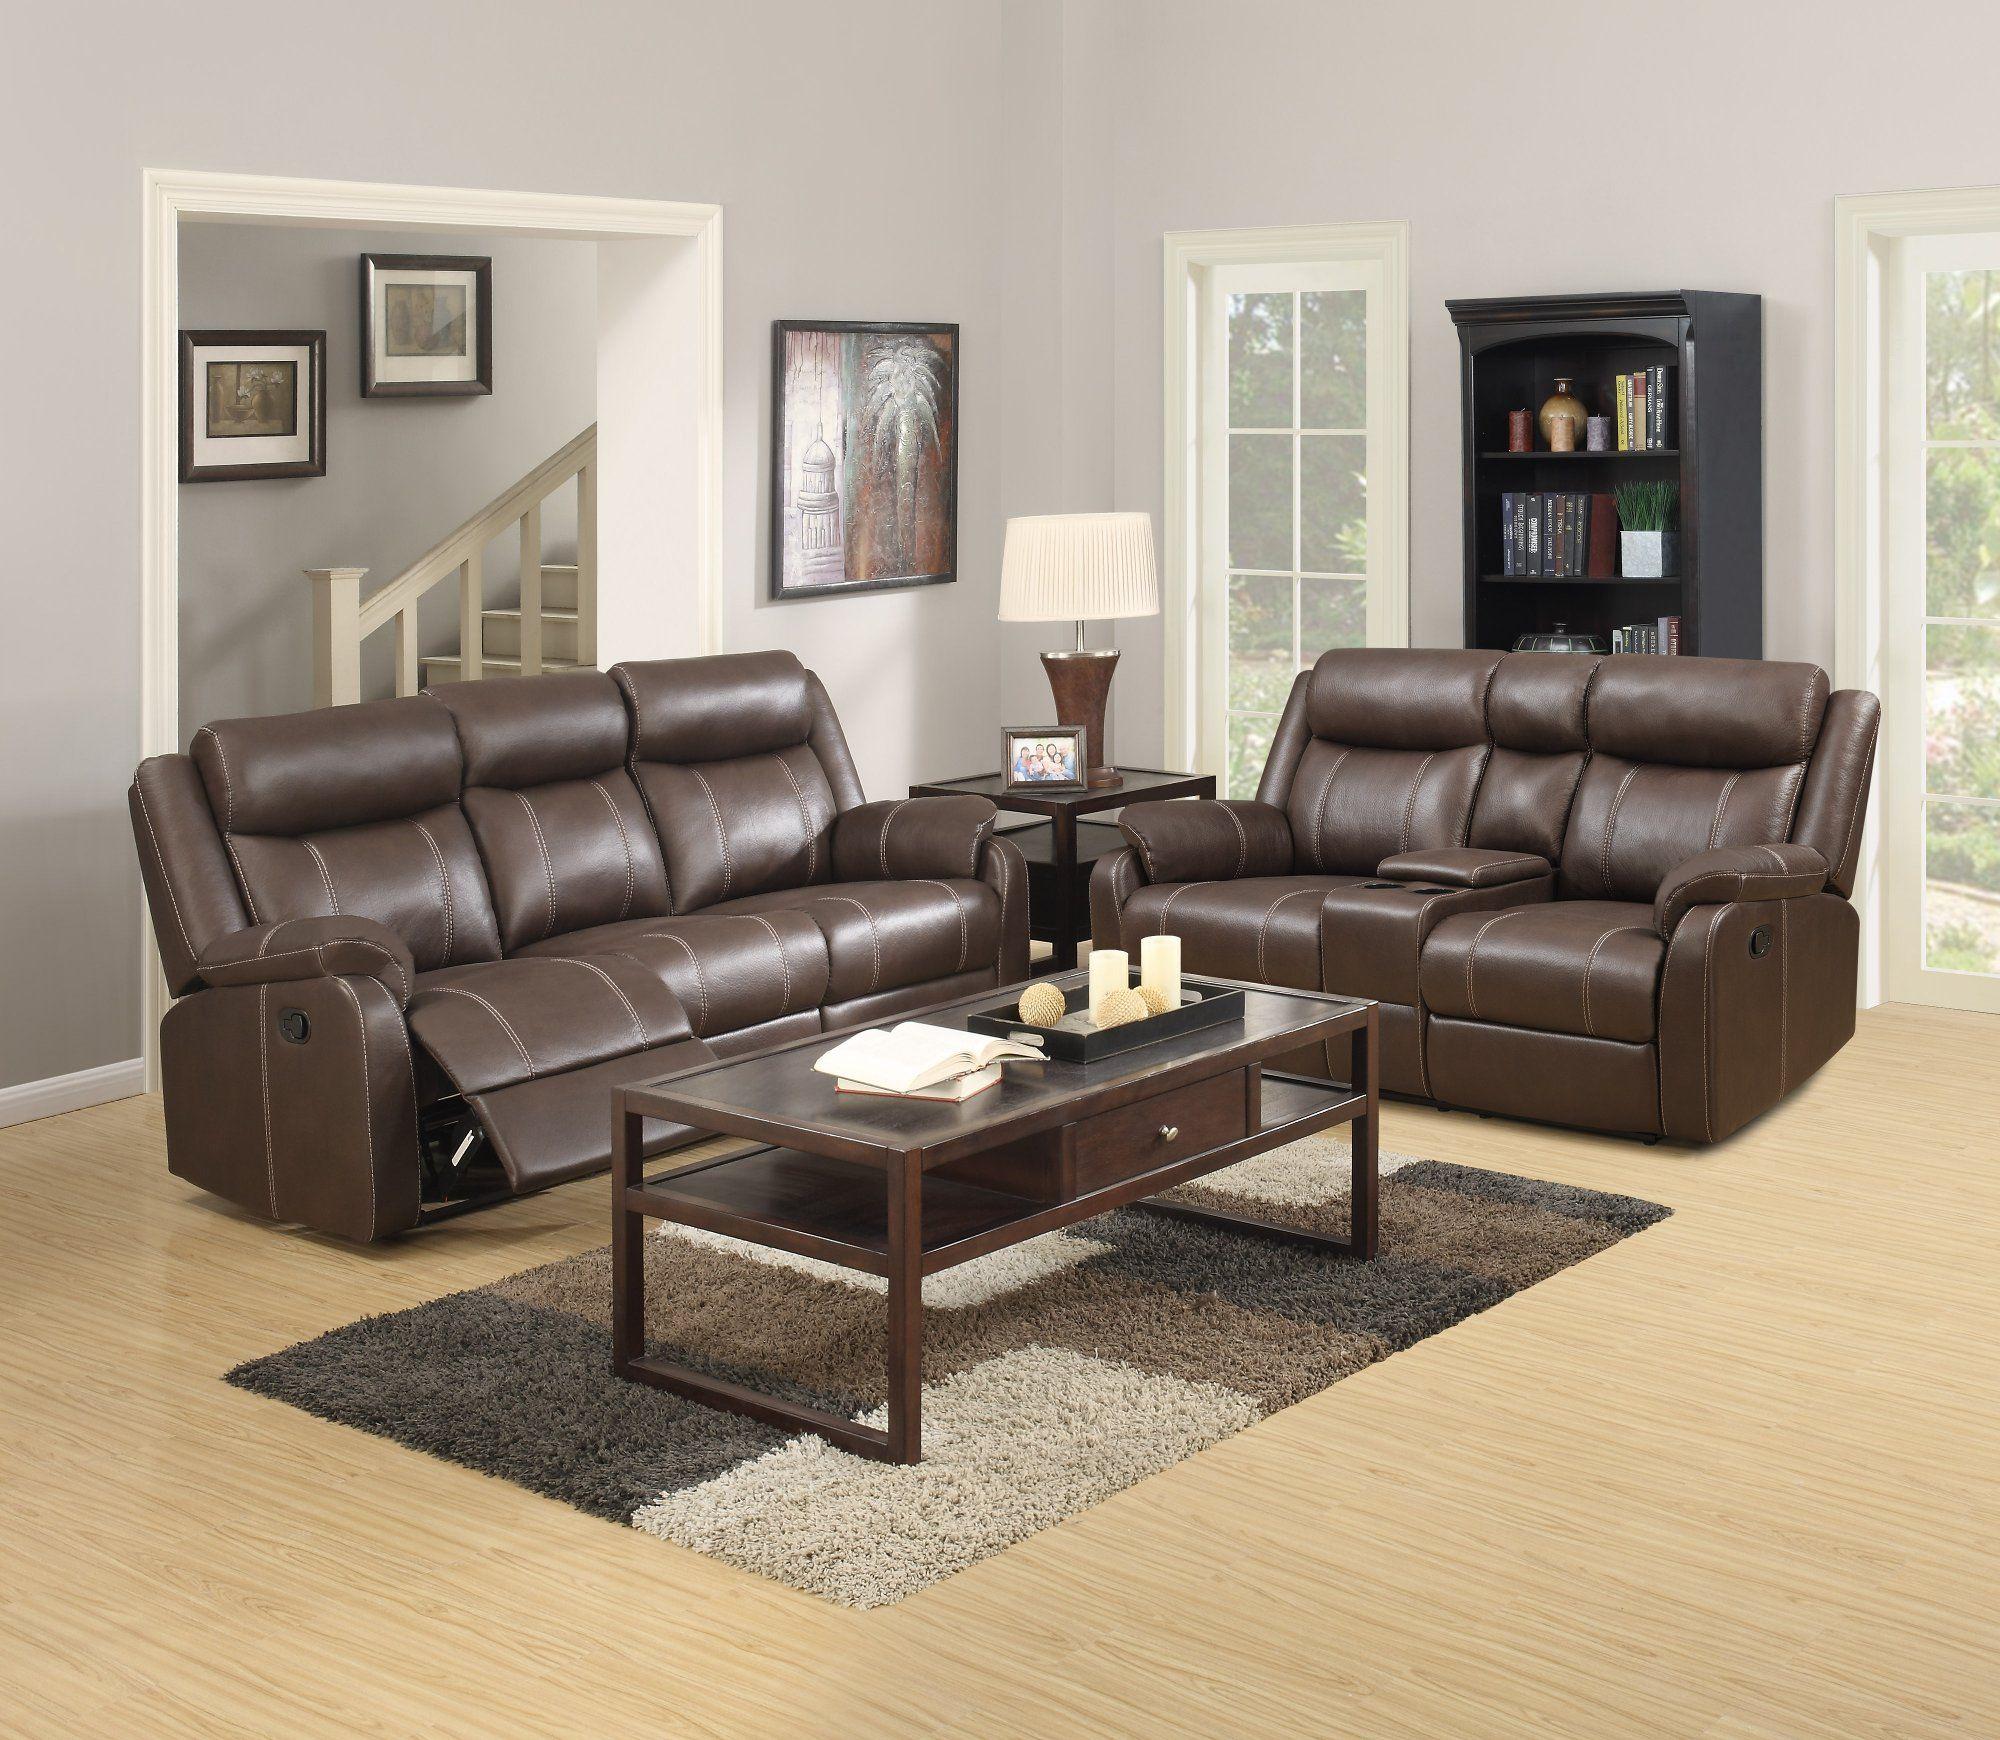 40++ Chocolate brown living room set ideas